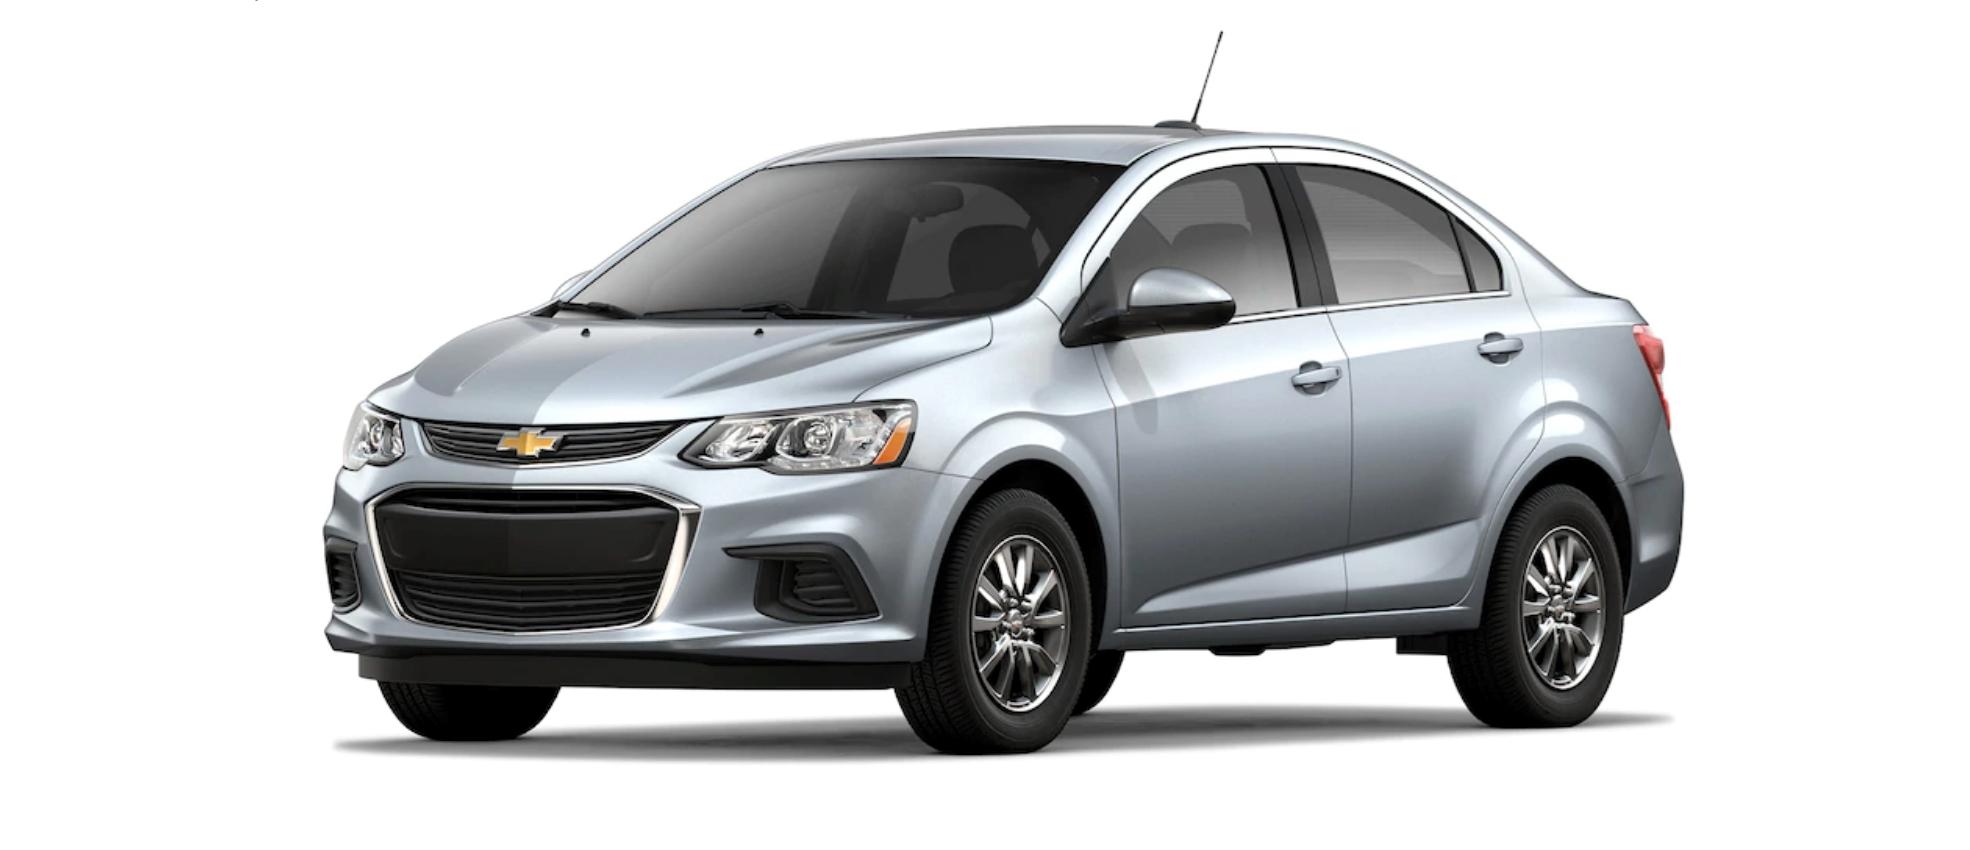 2017 Chevrolet Sonic Lt Sedan Full Specs  Features And